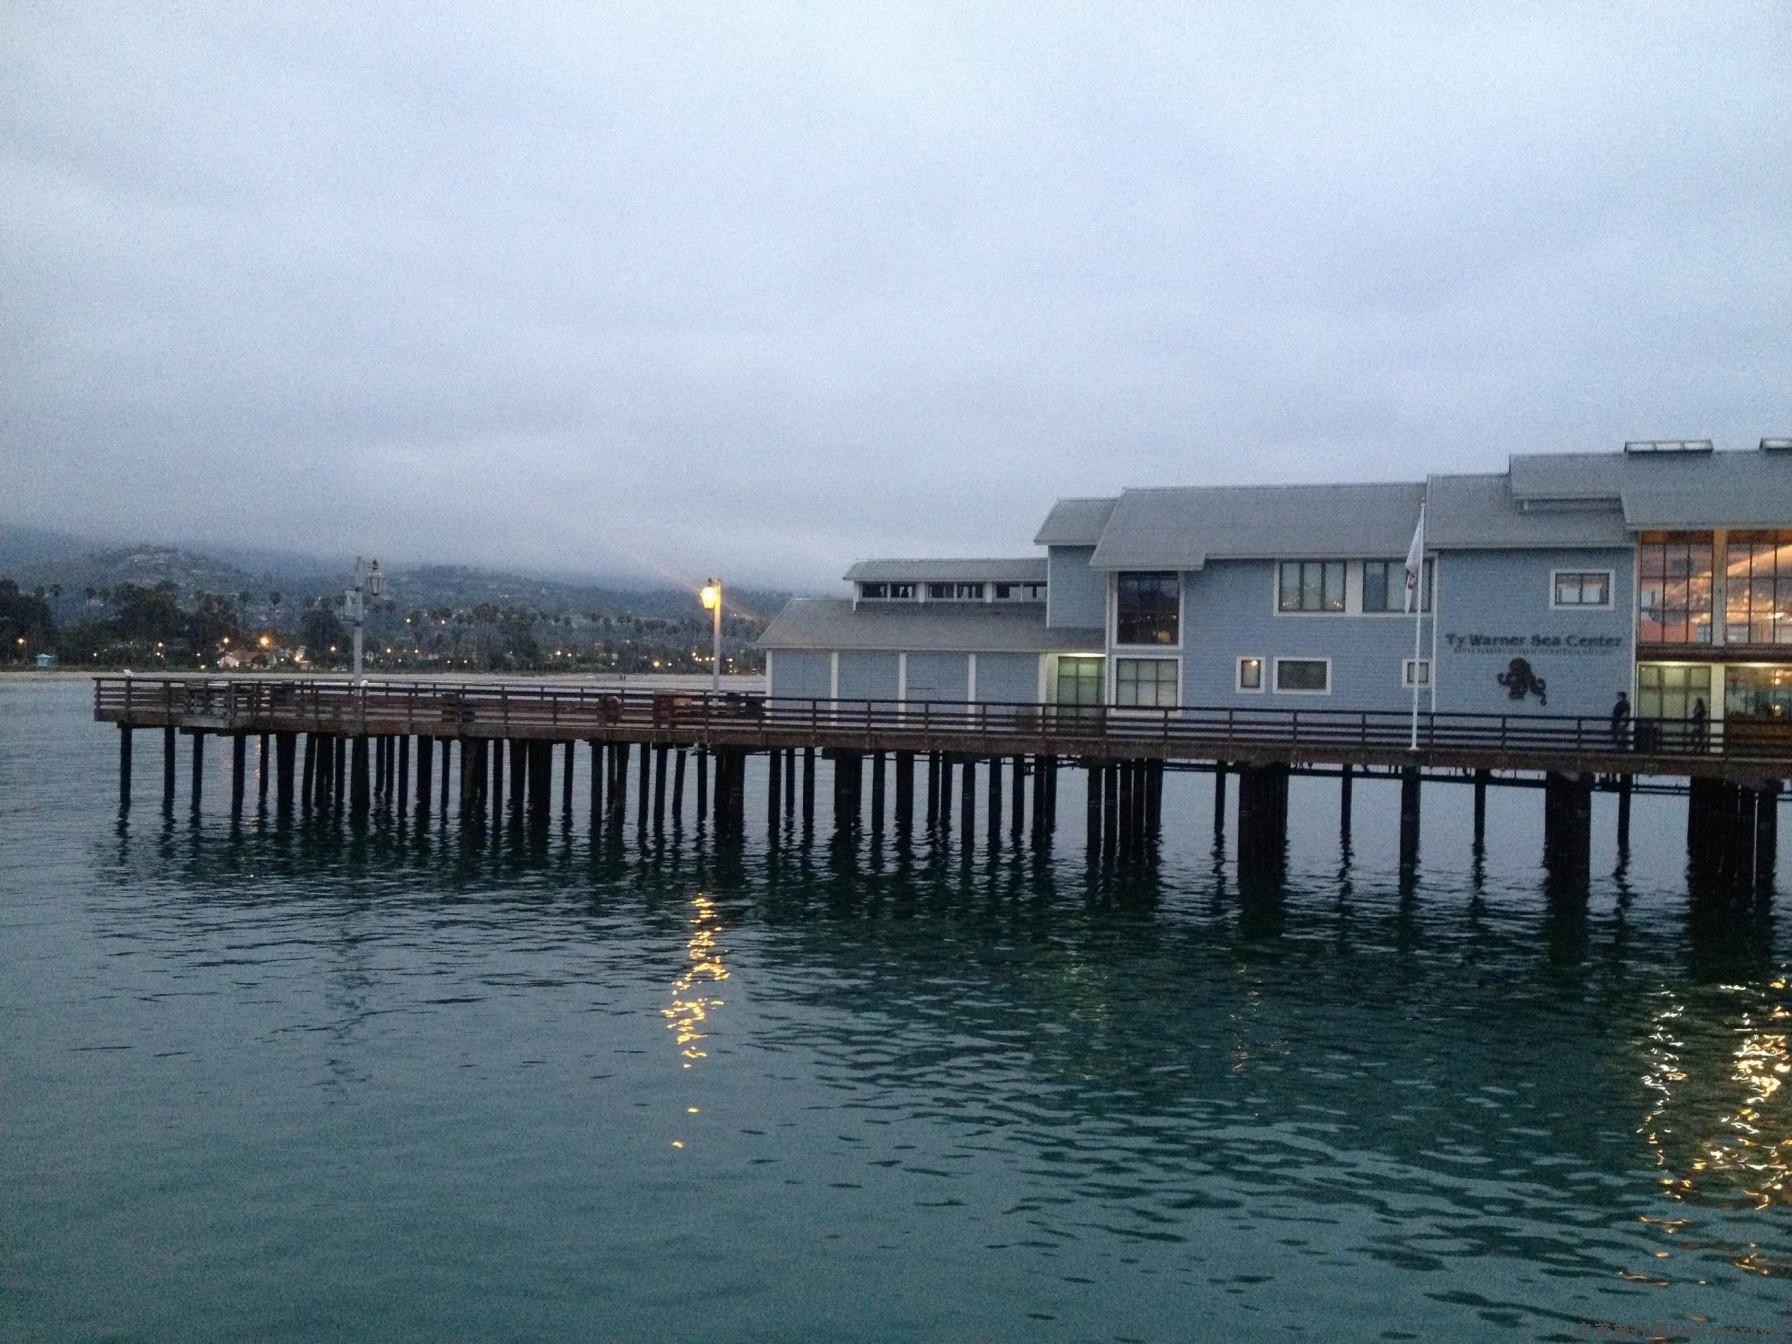 美西IHG自由行(五)-- 丹麦村,Santa Barbara, Camarill - 完美旅行Perfectravel - 完美旅行Perfectravel的博客